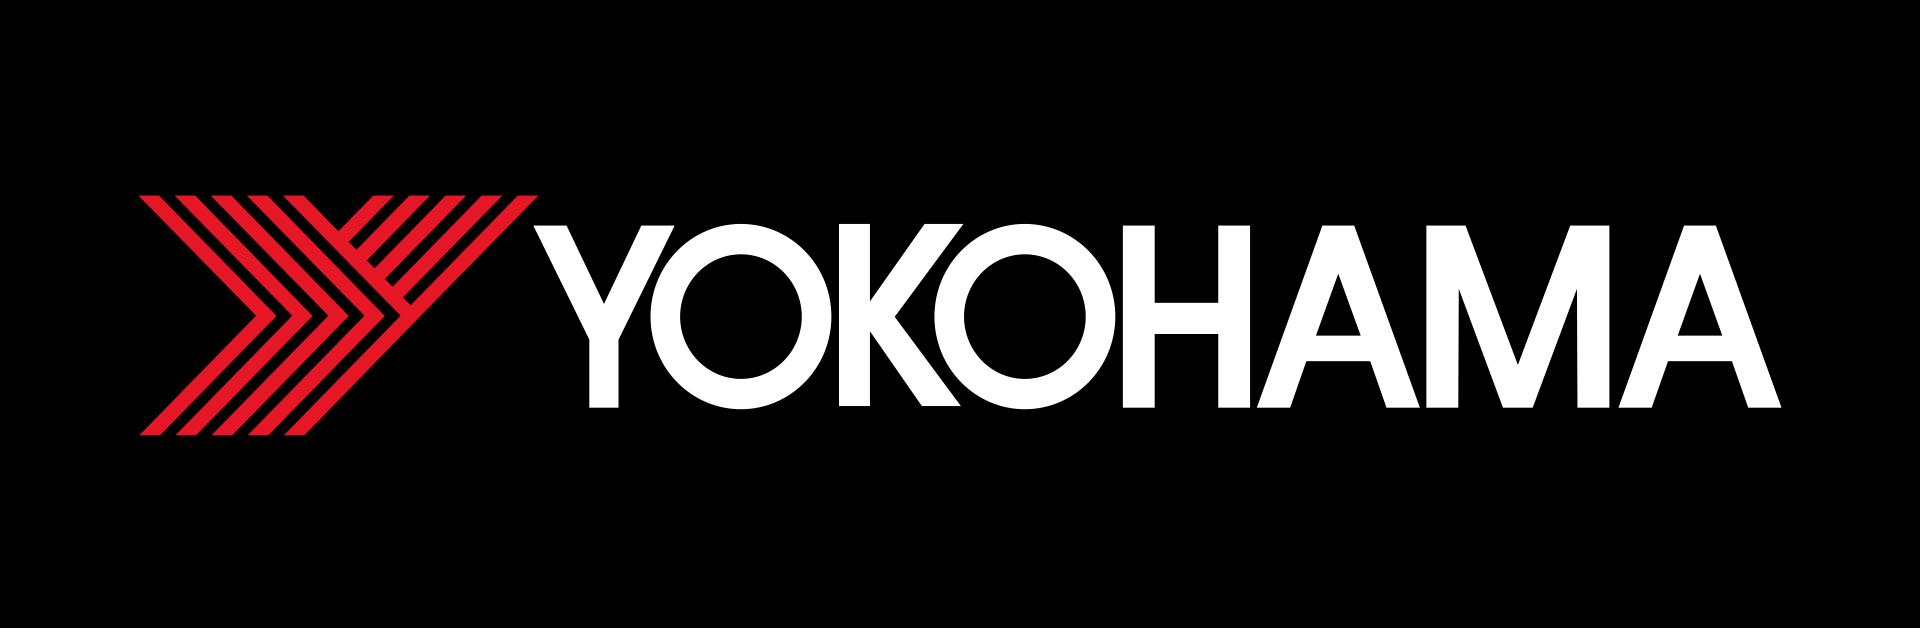 YOKOHAMA SK